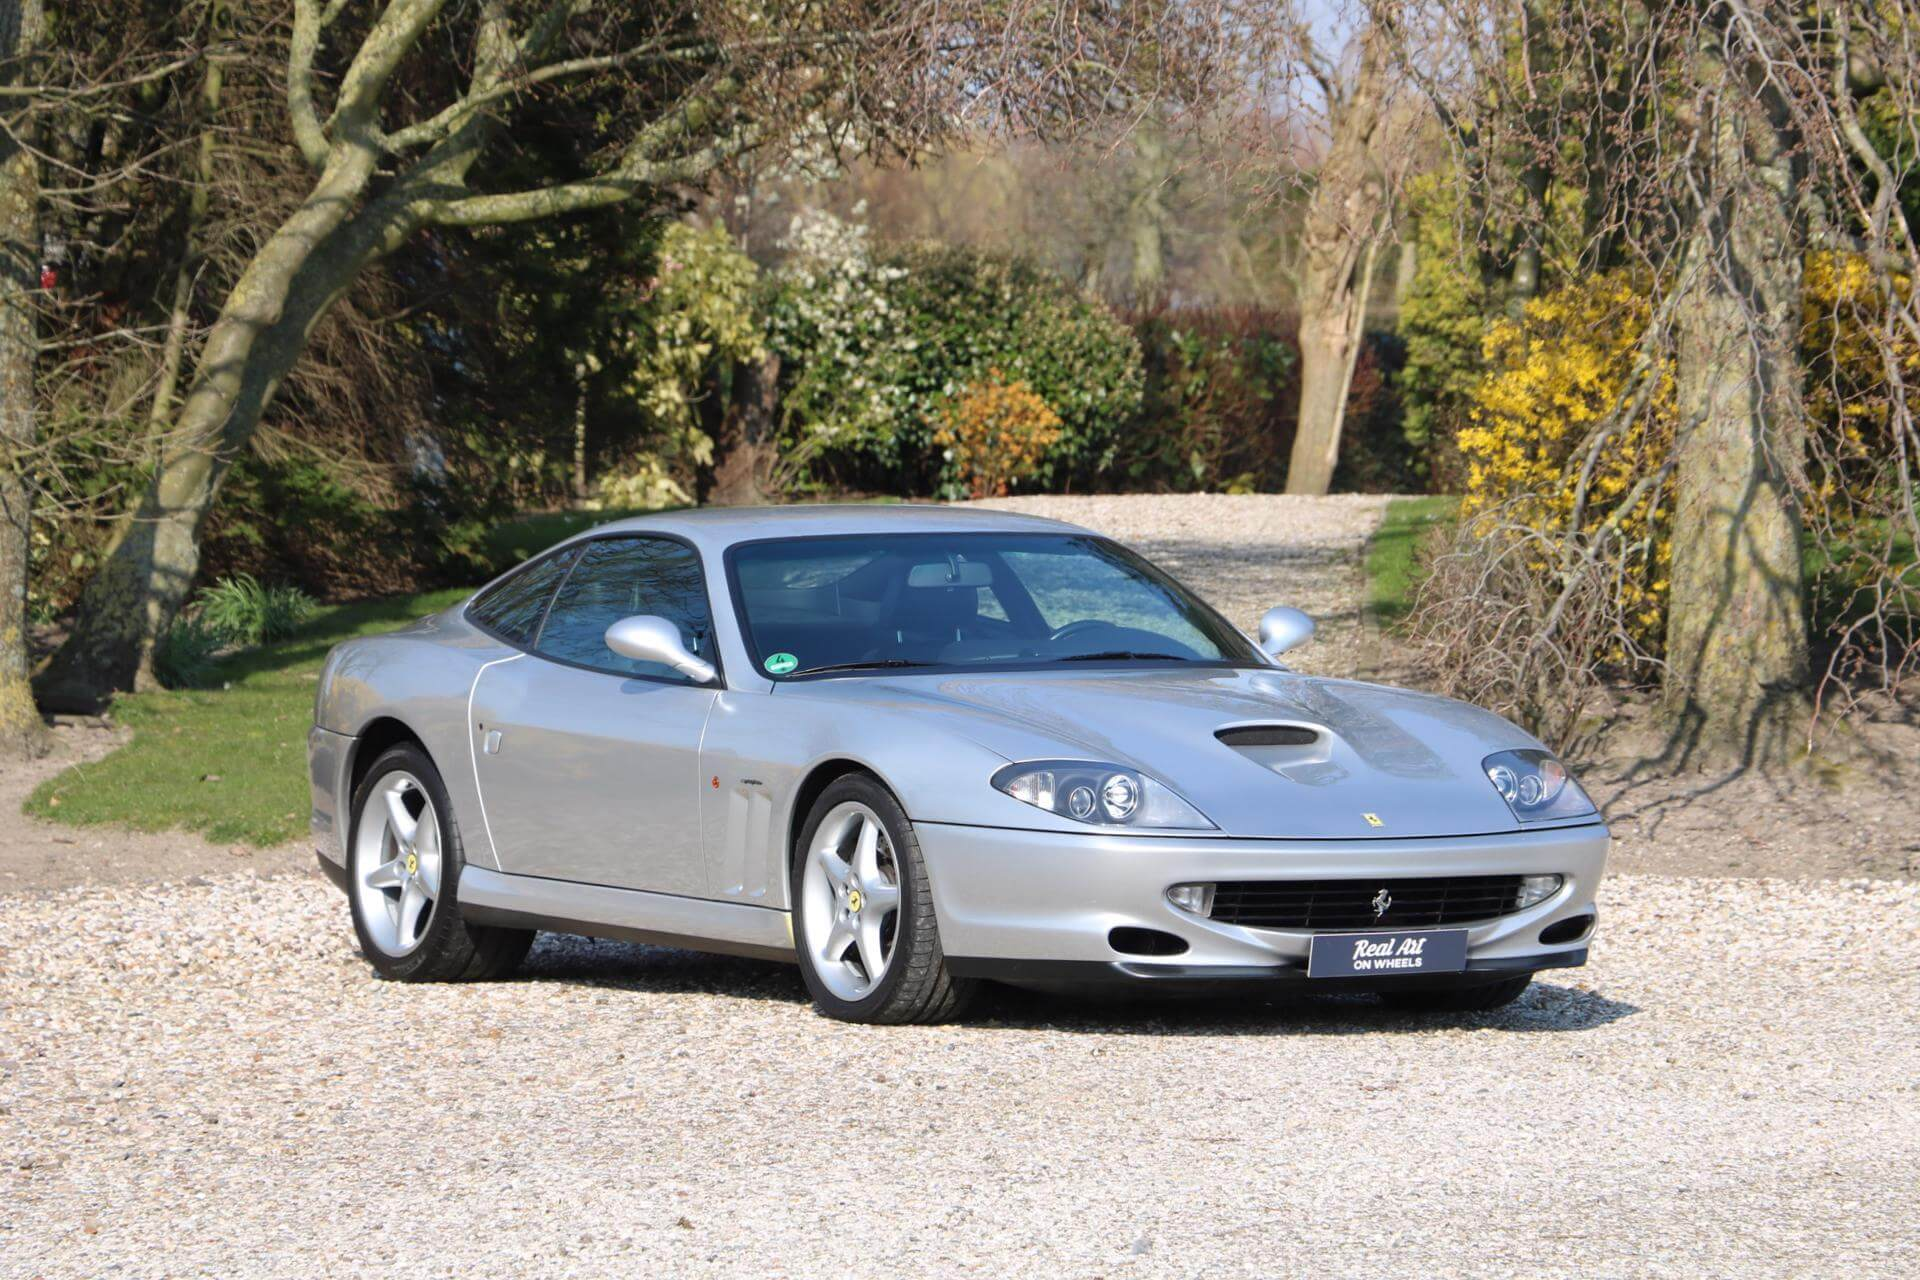 Real Art on Wheels | 1998 Ferrari 550 Maranello